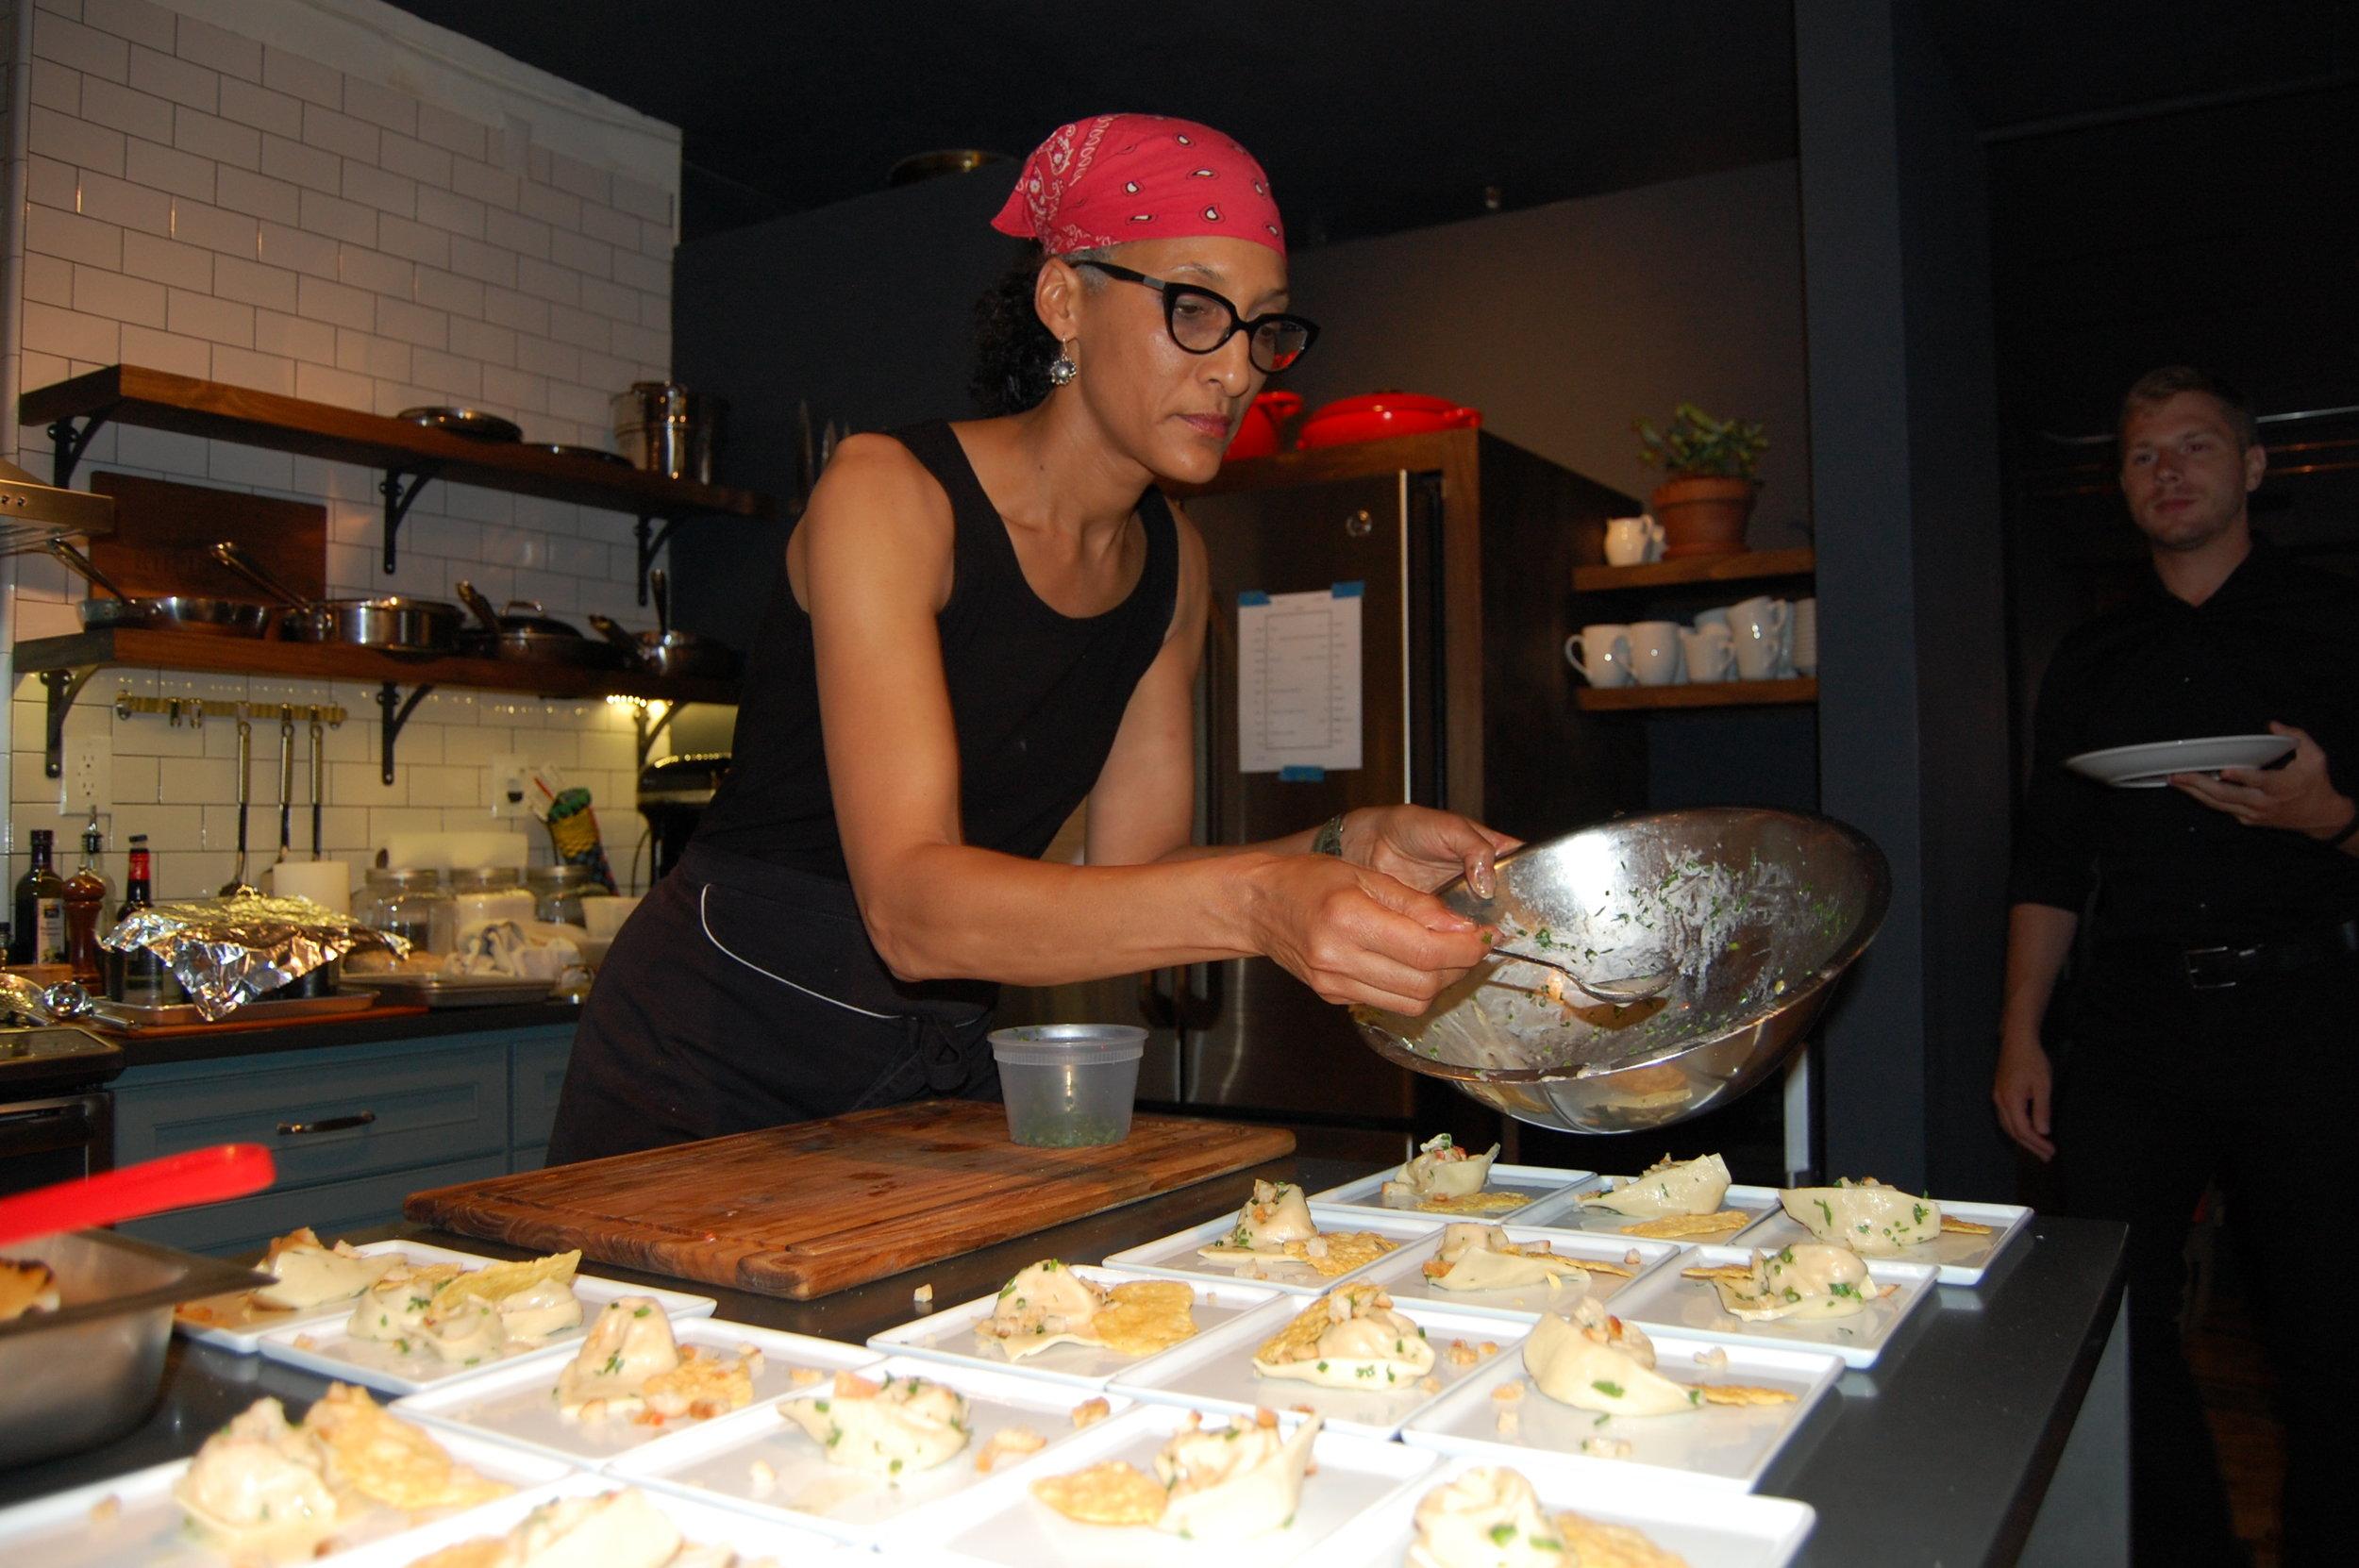 carla plating mac and cheese.JPG